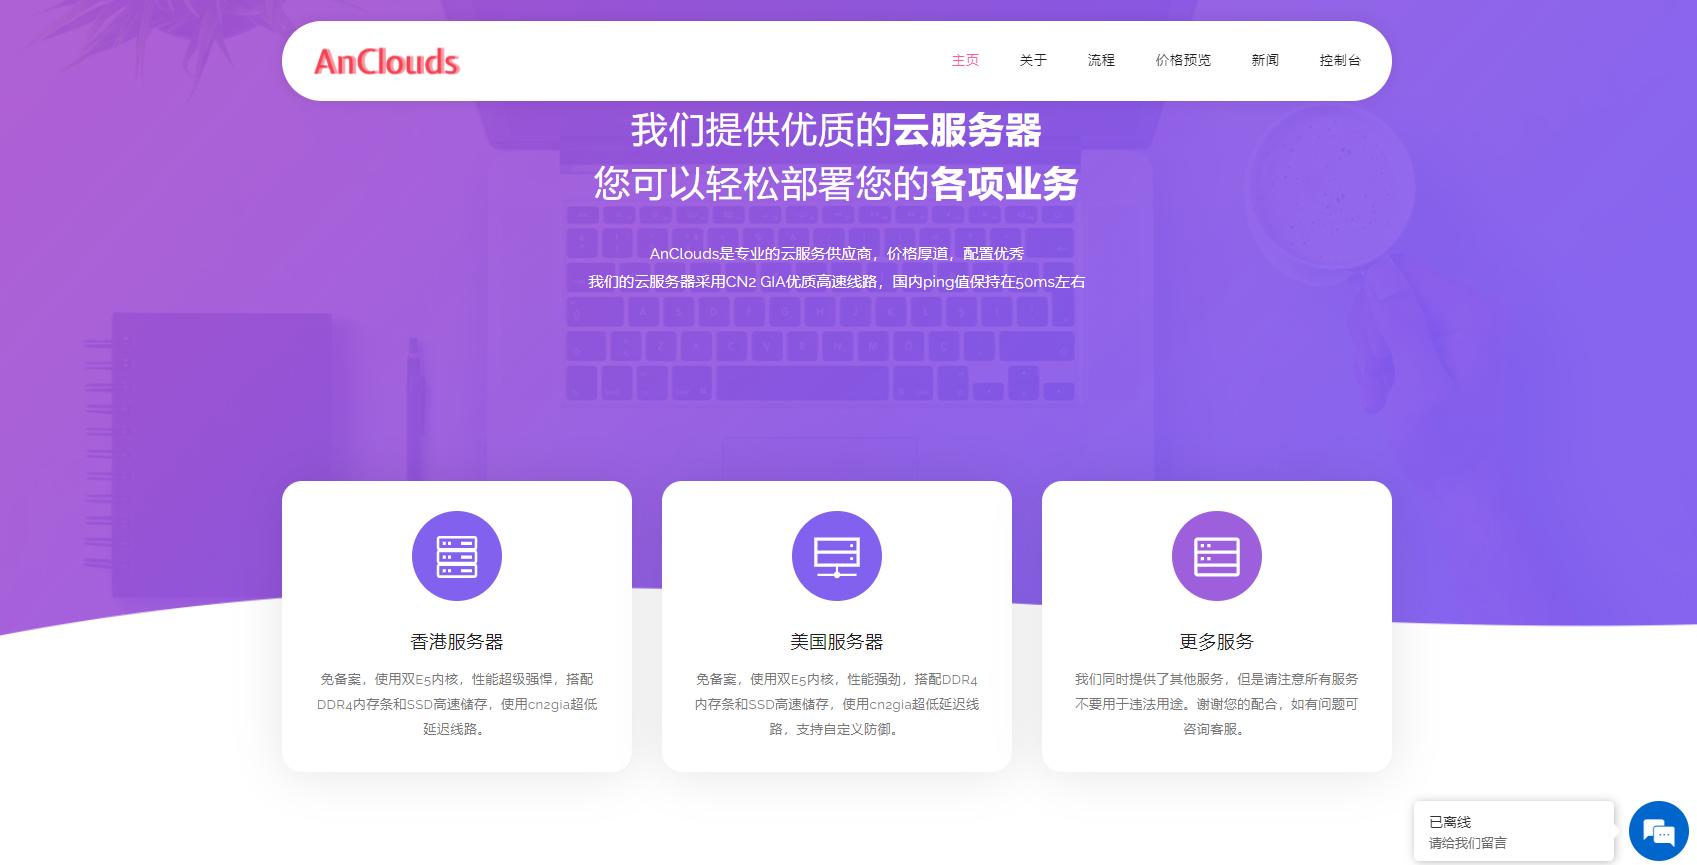 AnClouds特惠开启,香港CN2GIA最低仅9元每月起,续费同价,台湾物理服务器上线